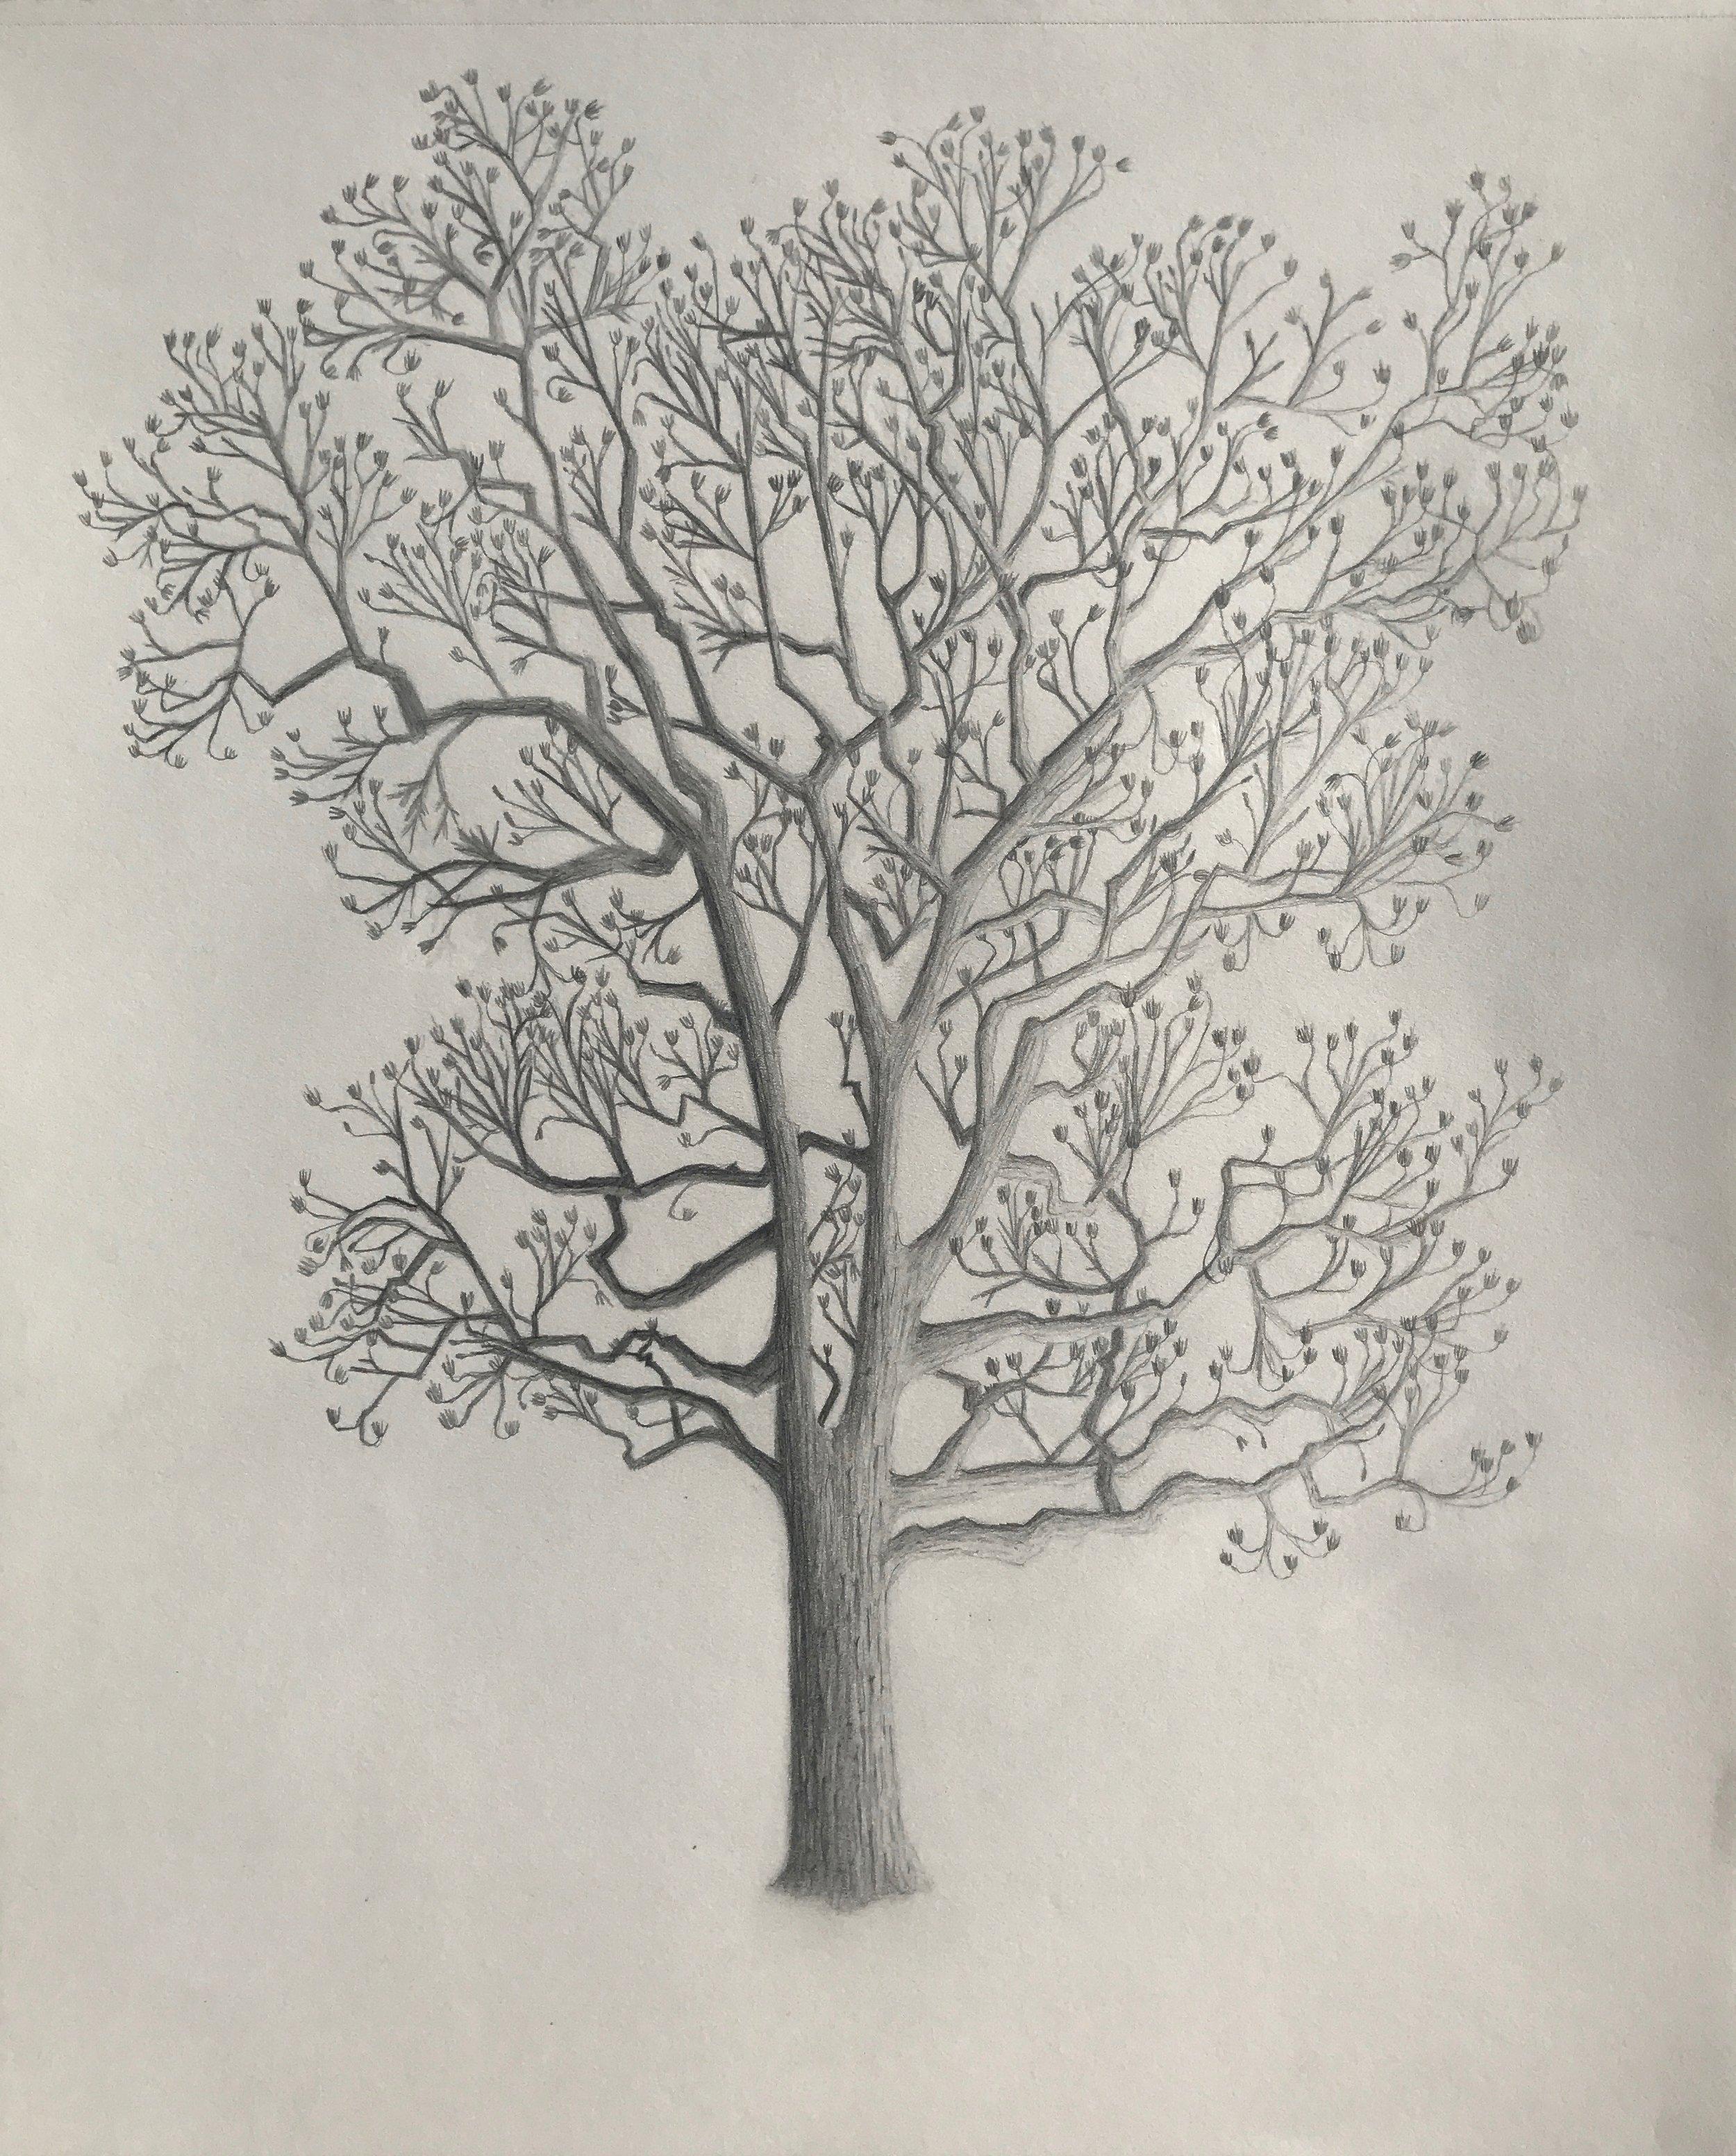 Winter Tulip Tree illustration by  Jessica Maffia